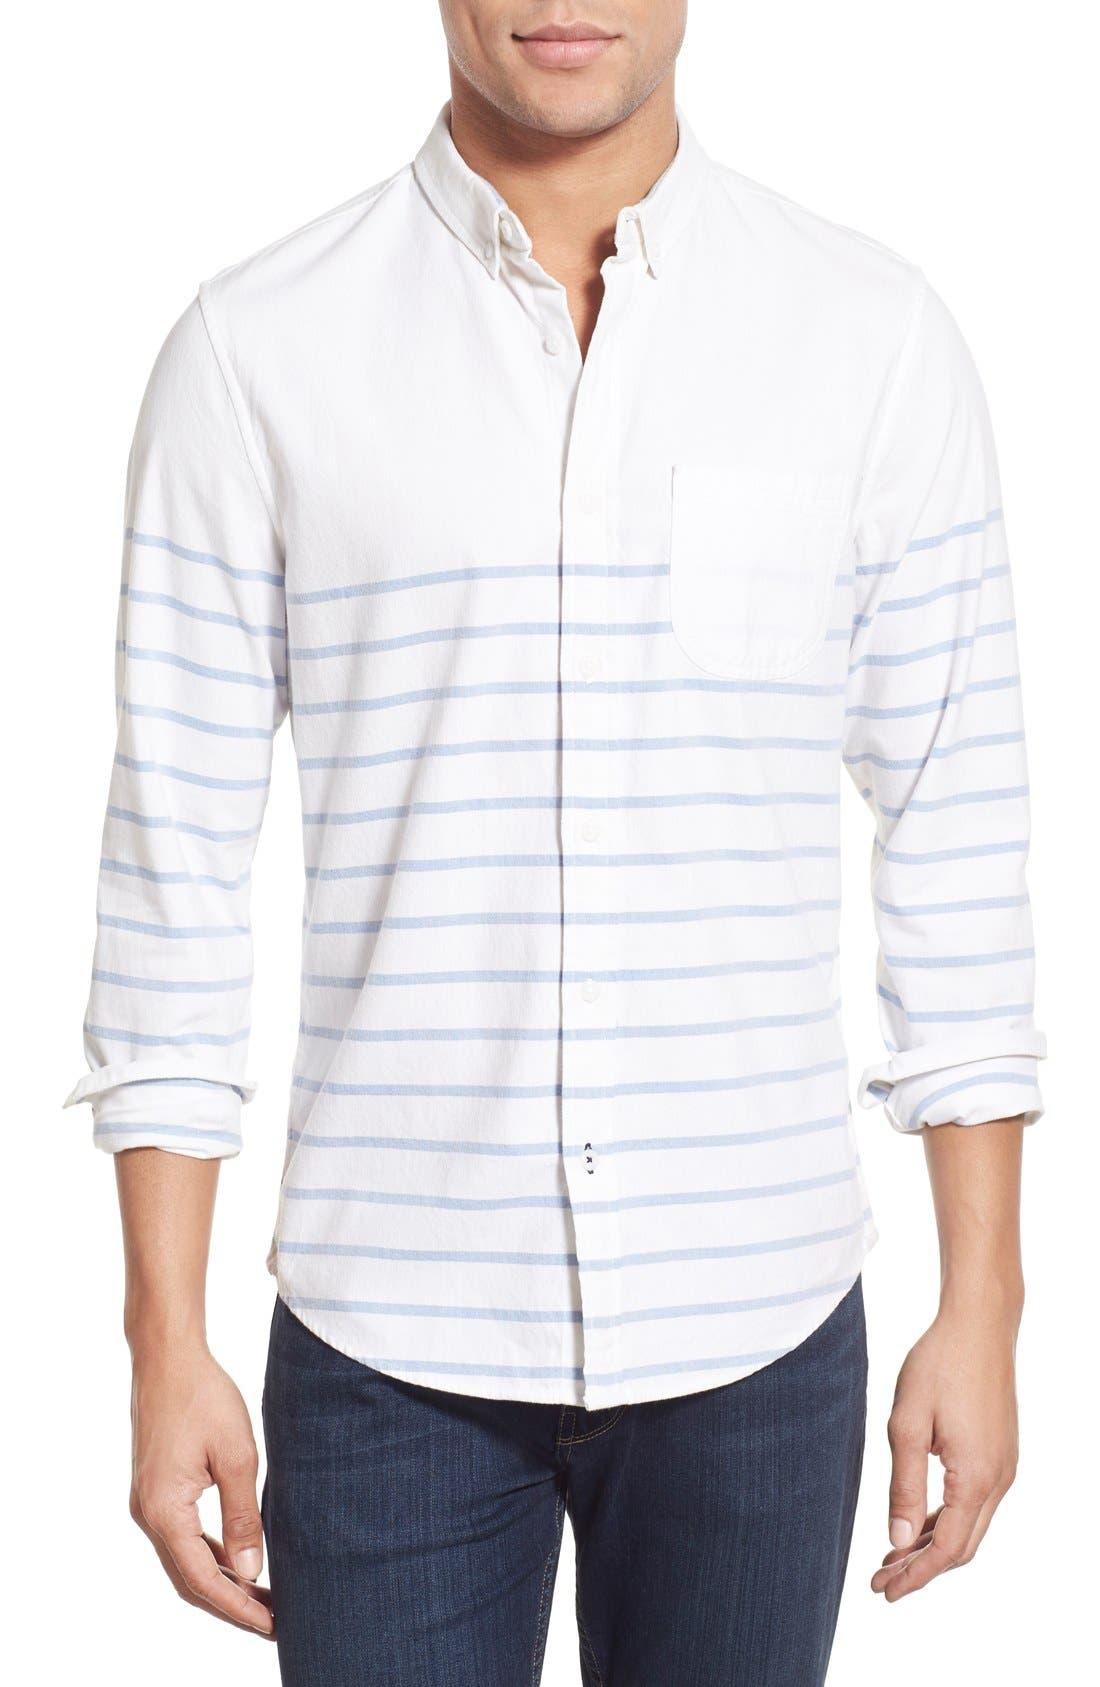 Alternate Image 1 Selected - 1901 'La Conner' Trim Fit Stripe Print Woven Shirt